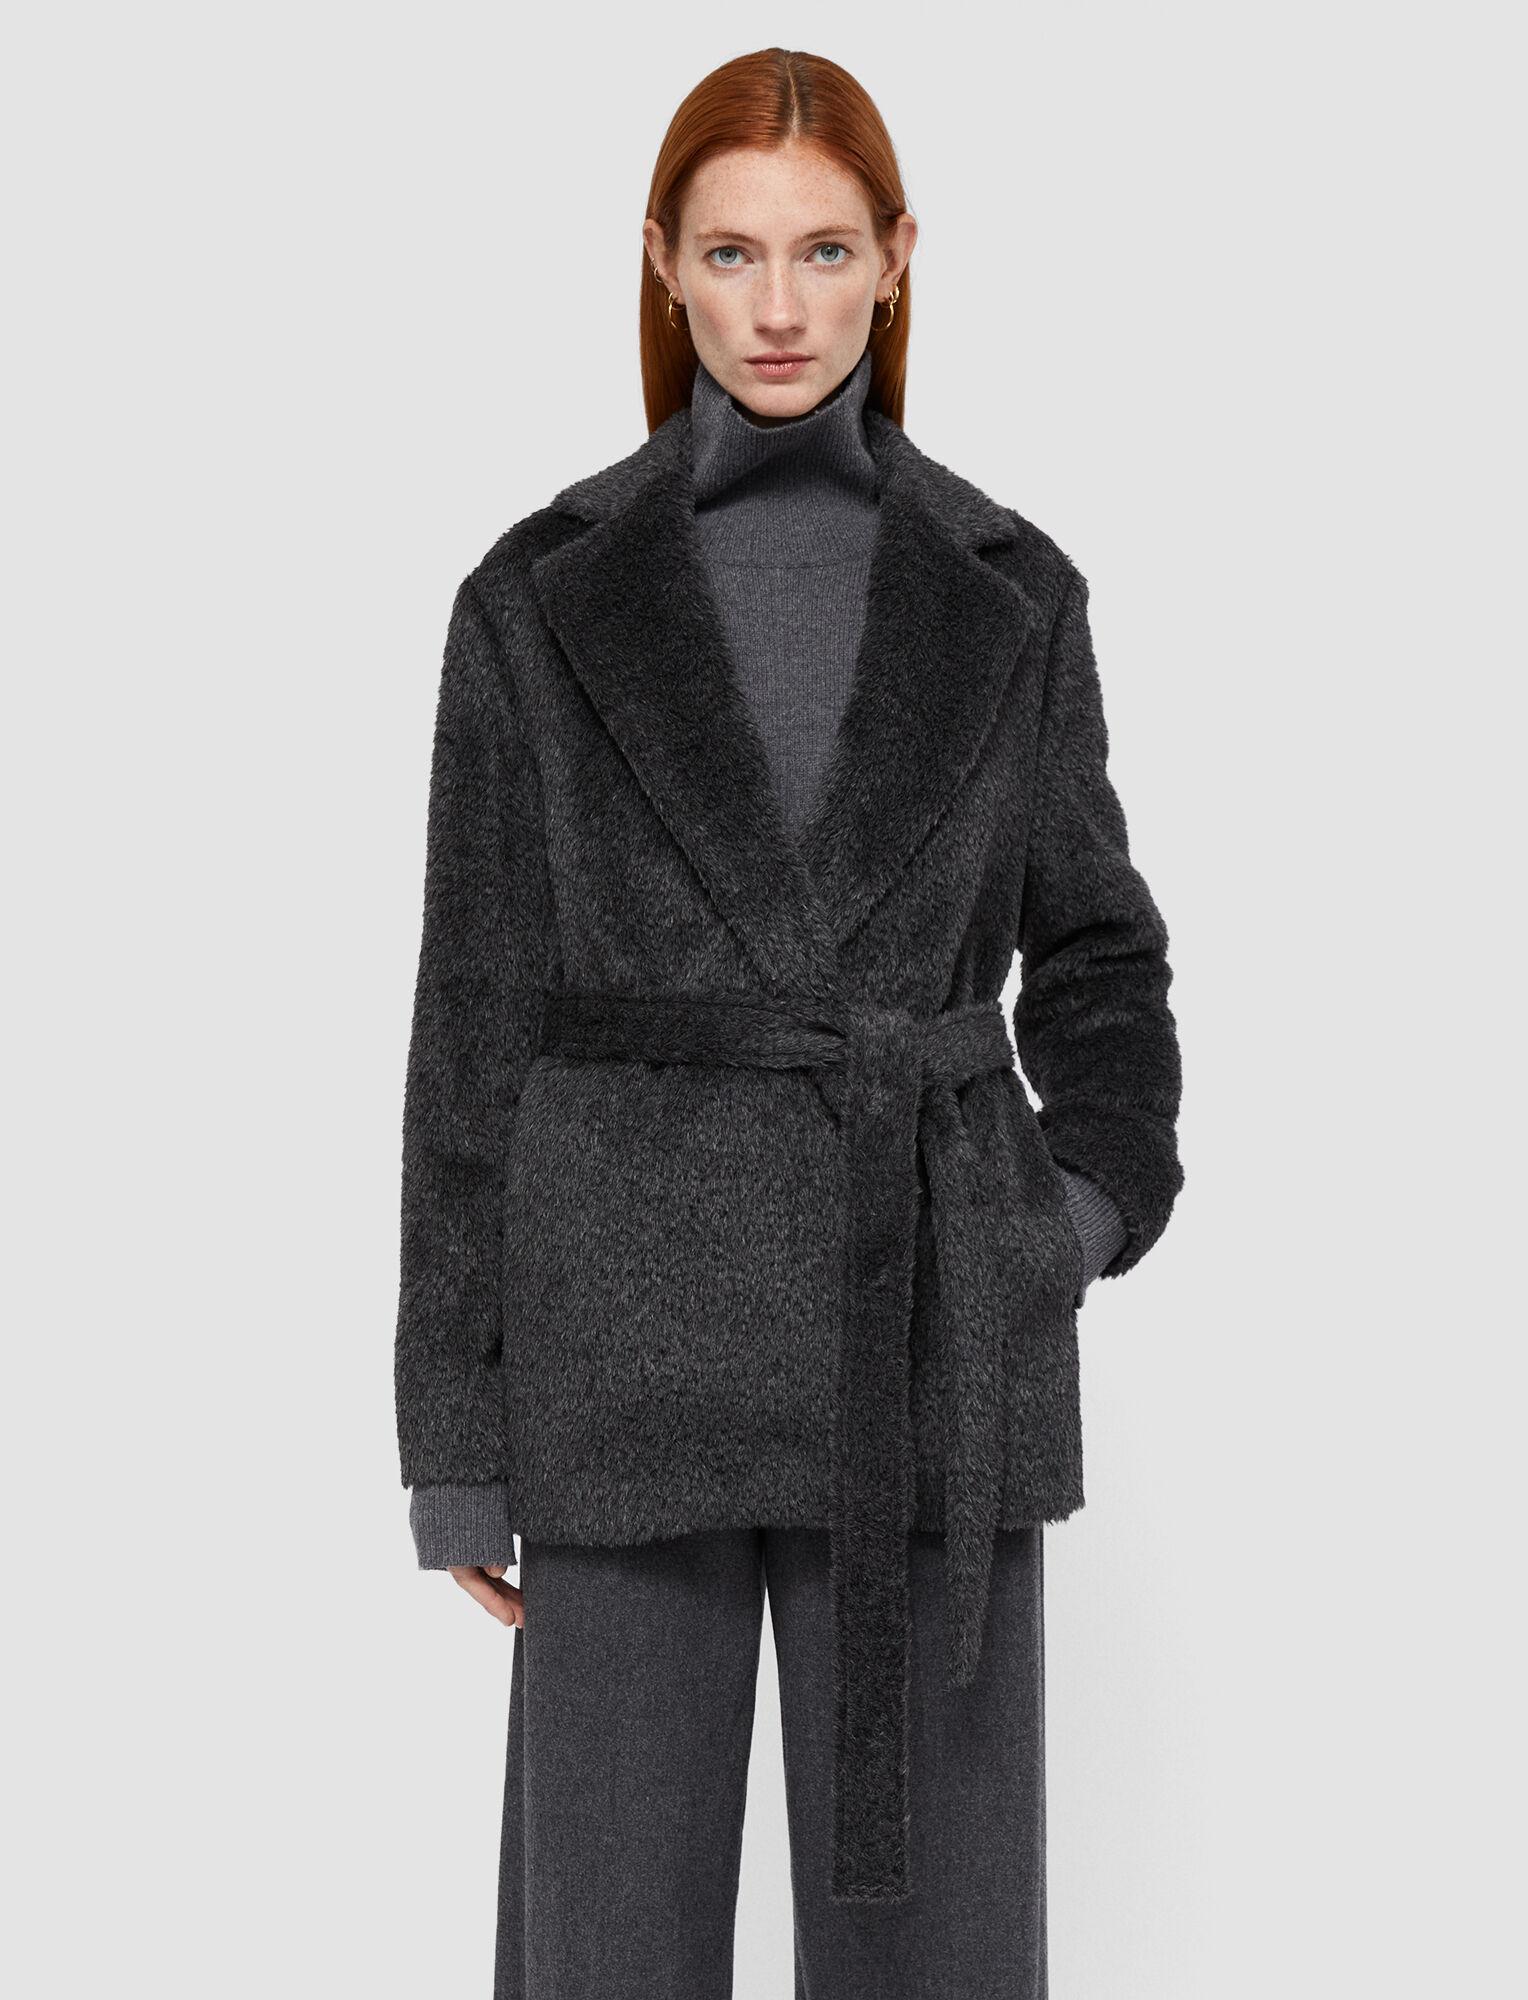 Joseph, Textured Wool Alpaca Cenda Coat, in Nickel